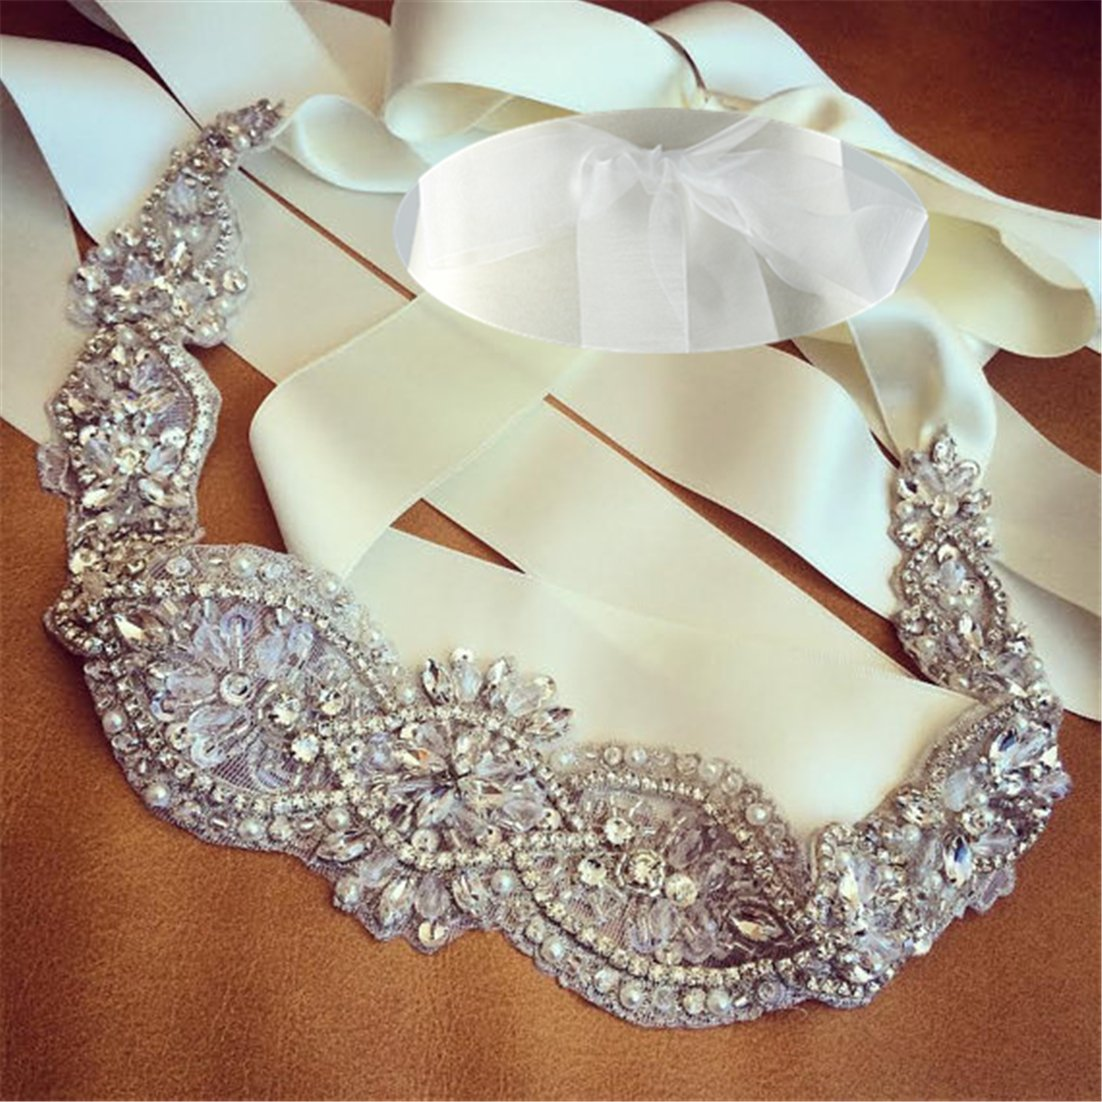 QueenDream bridal belts White Organza crystal belt bridesmaid dress belt rhinestone belts crystal belts for women For Prom Party Evening Dresses